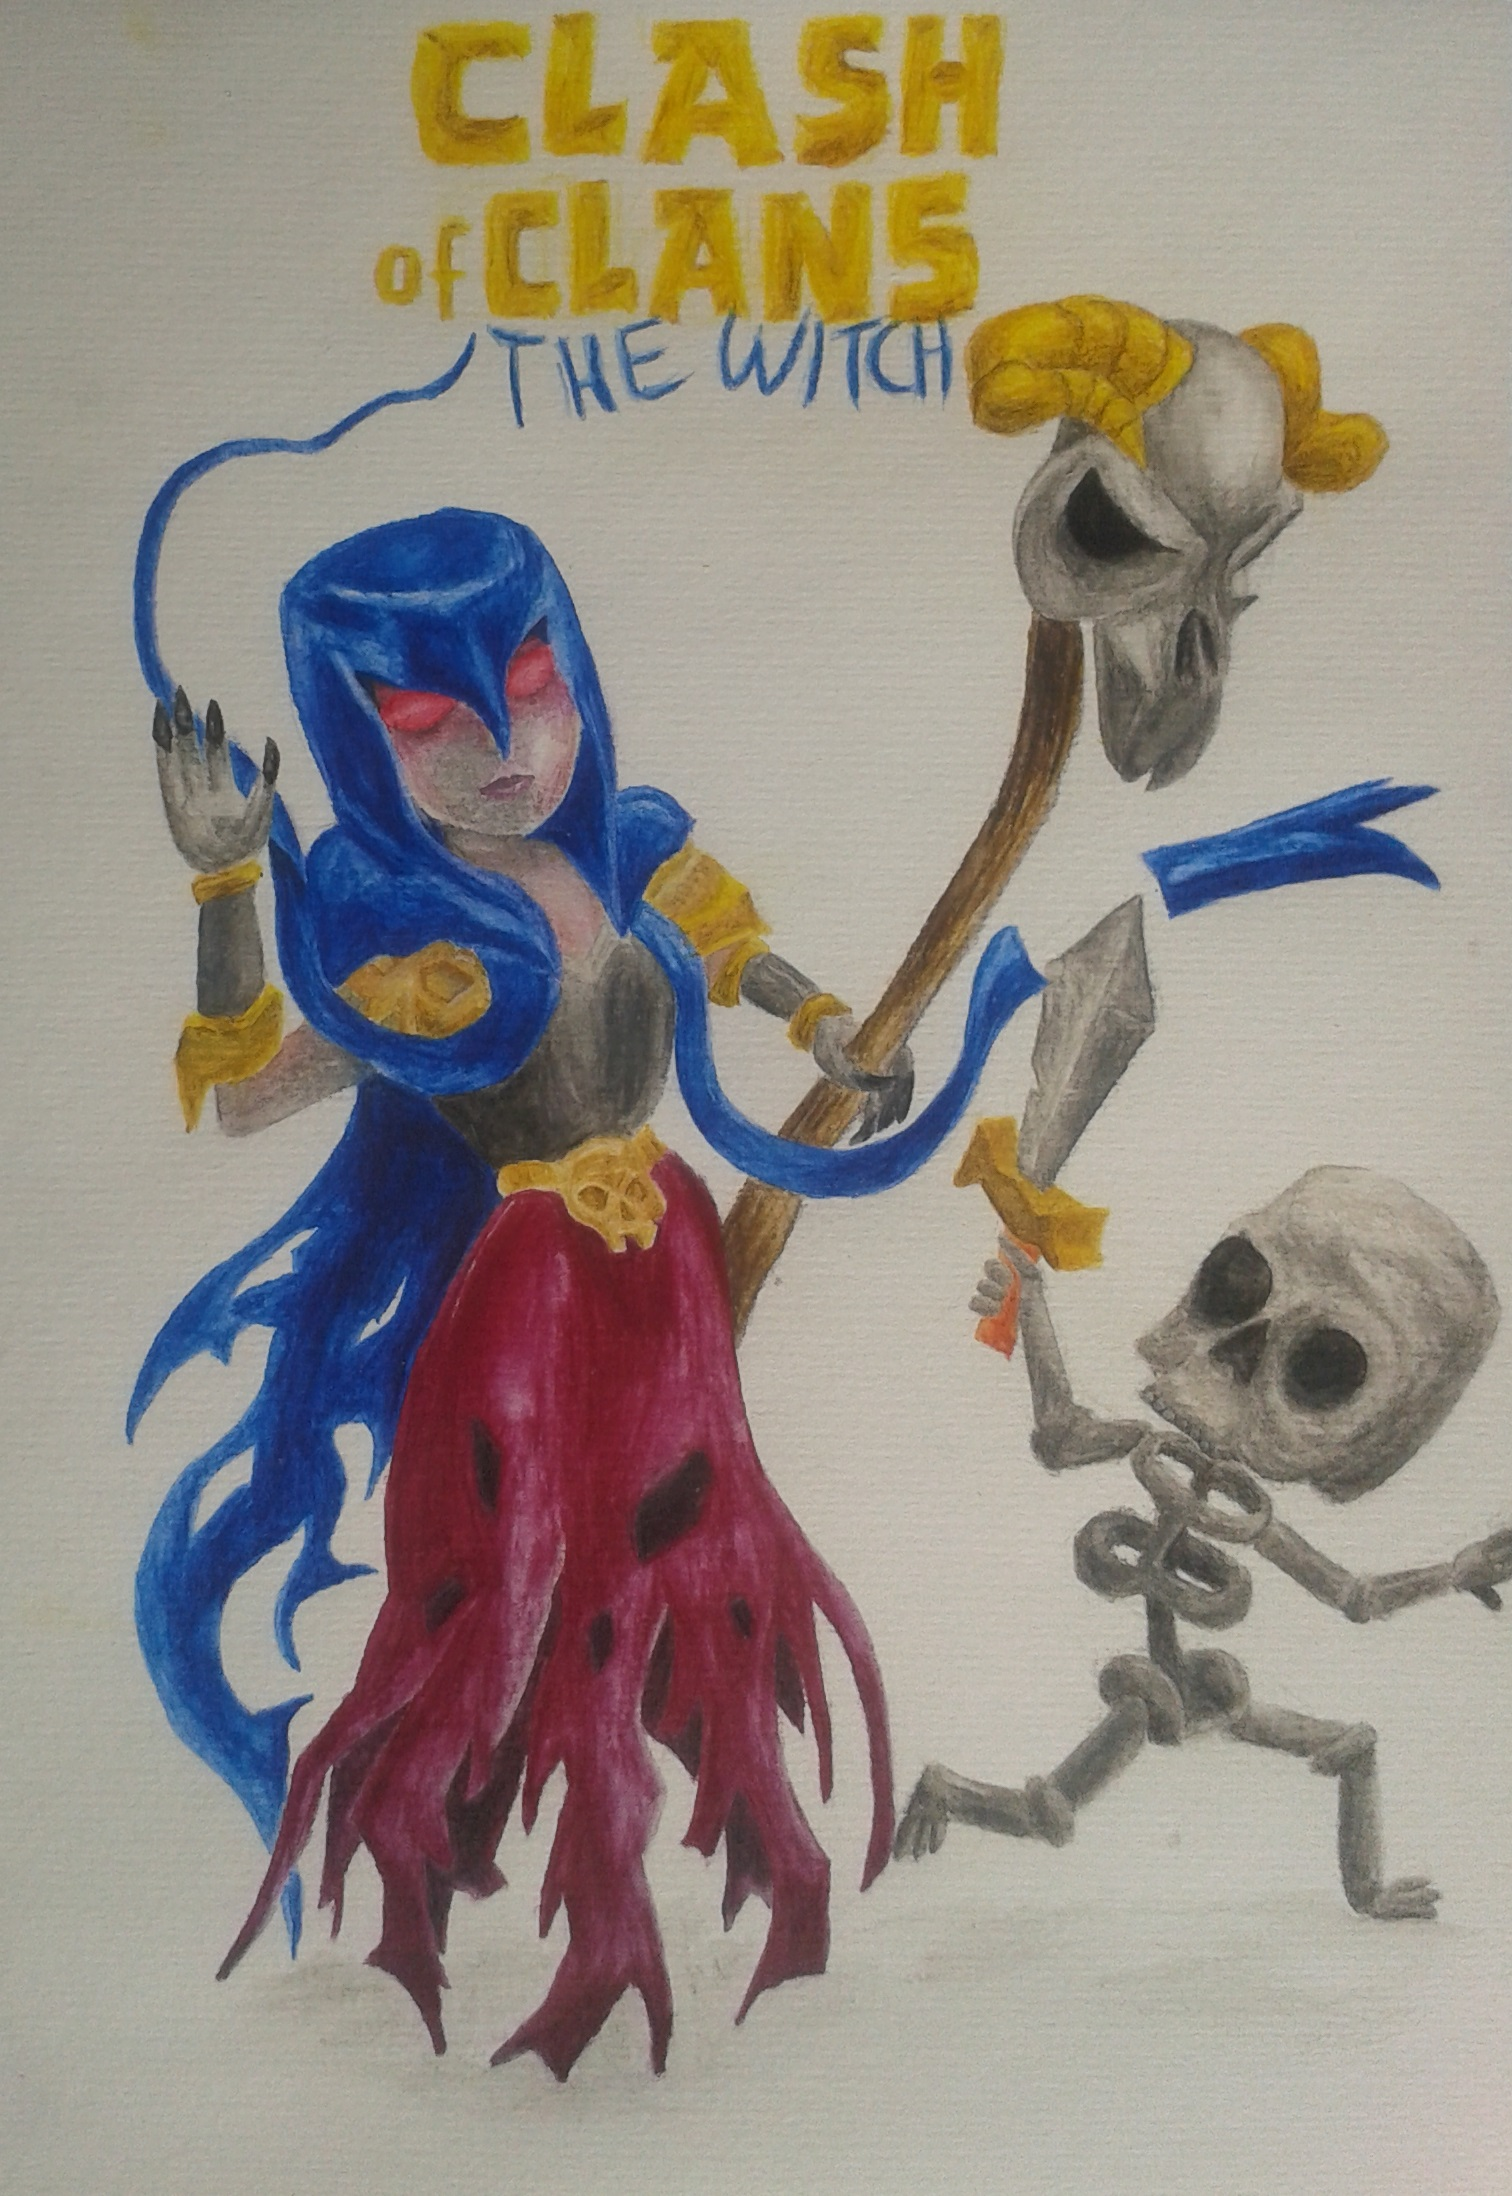 Clash of Clans Witch by xEismondx on DeviantArt